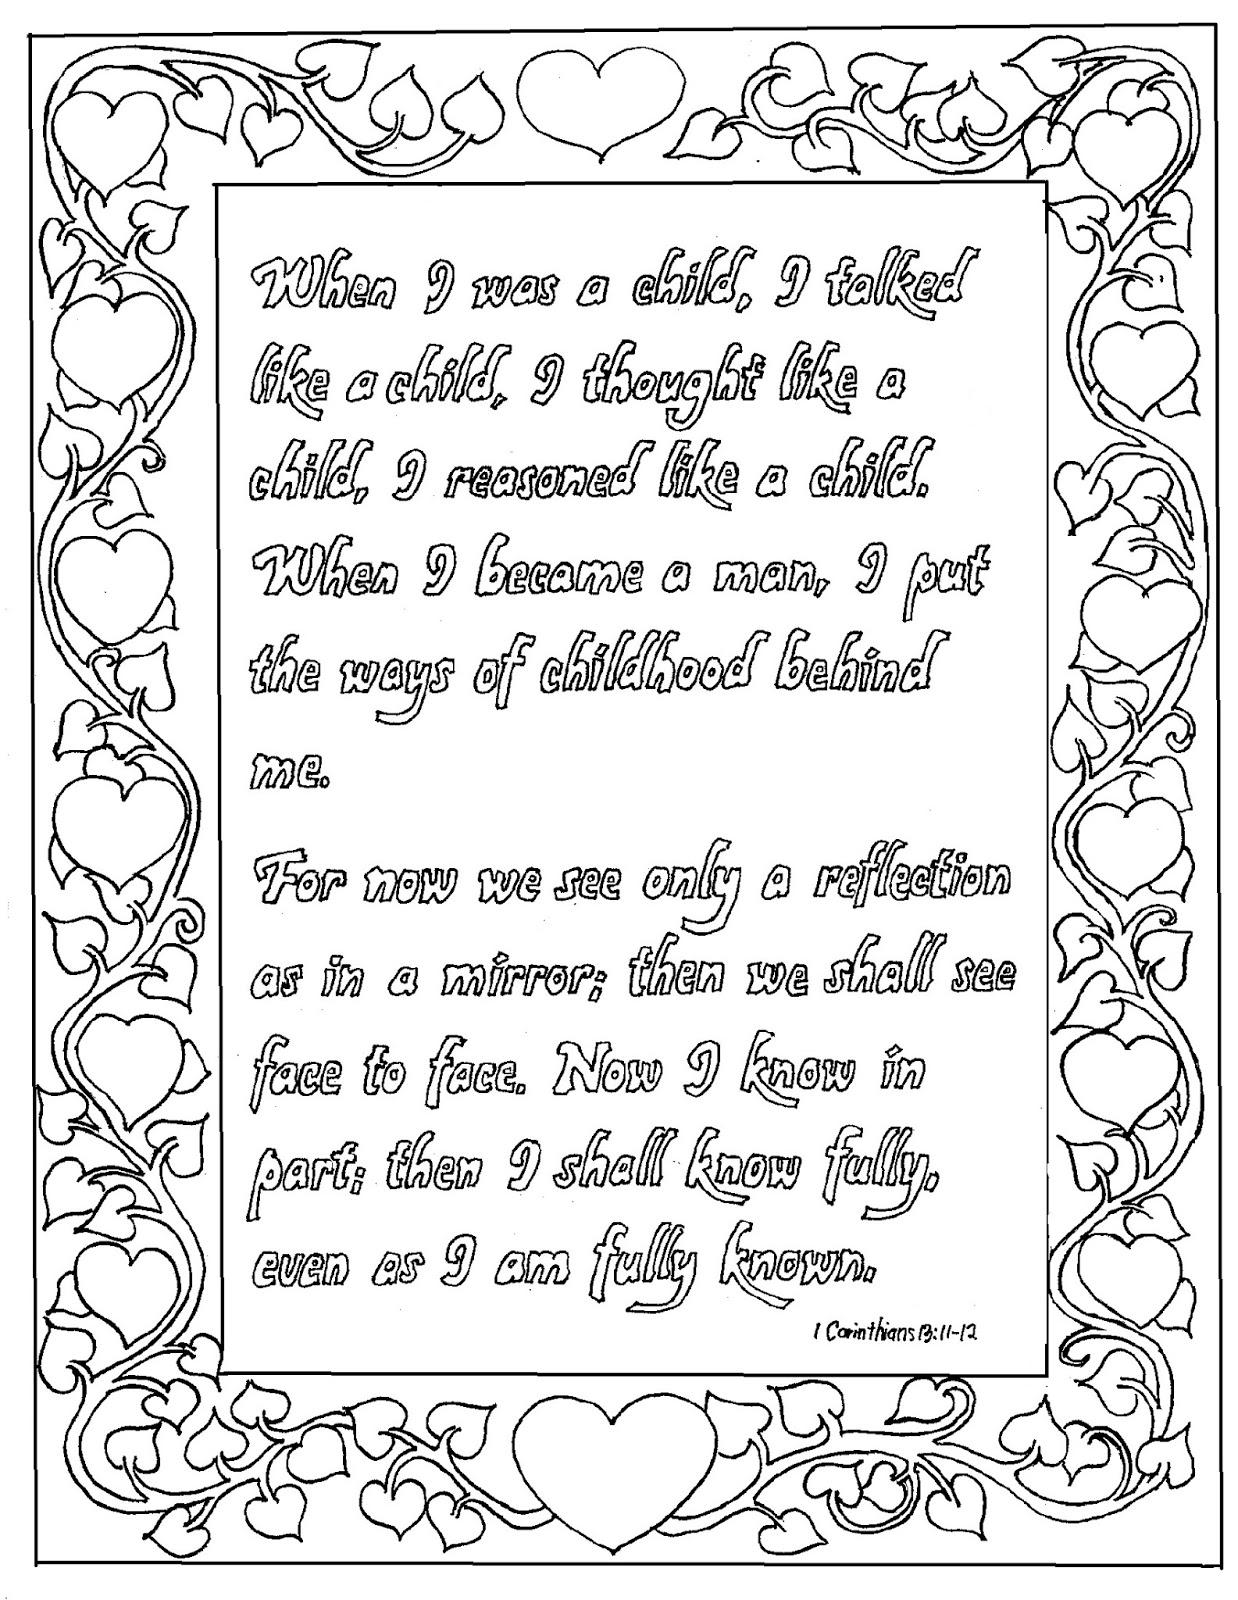 Printable 1 Corinthians 1311 12 Coloring Page